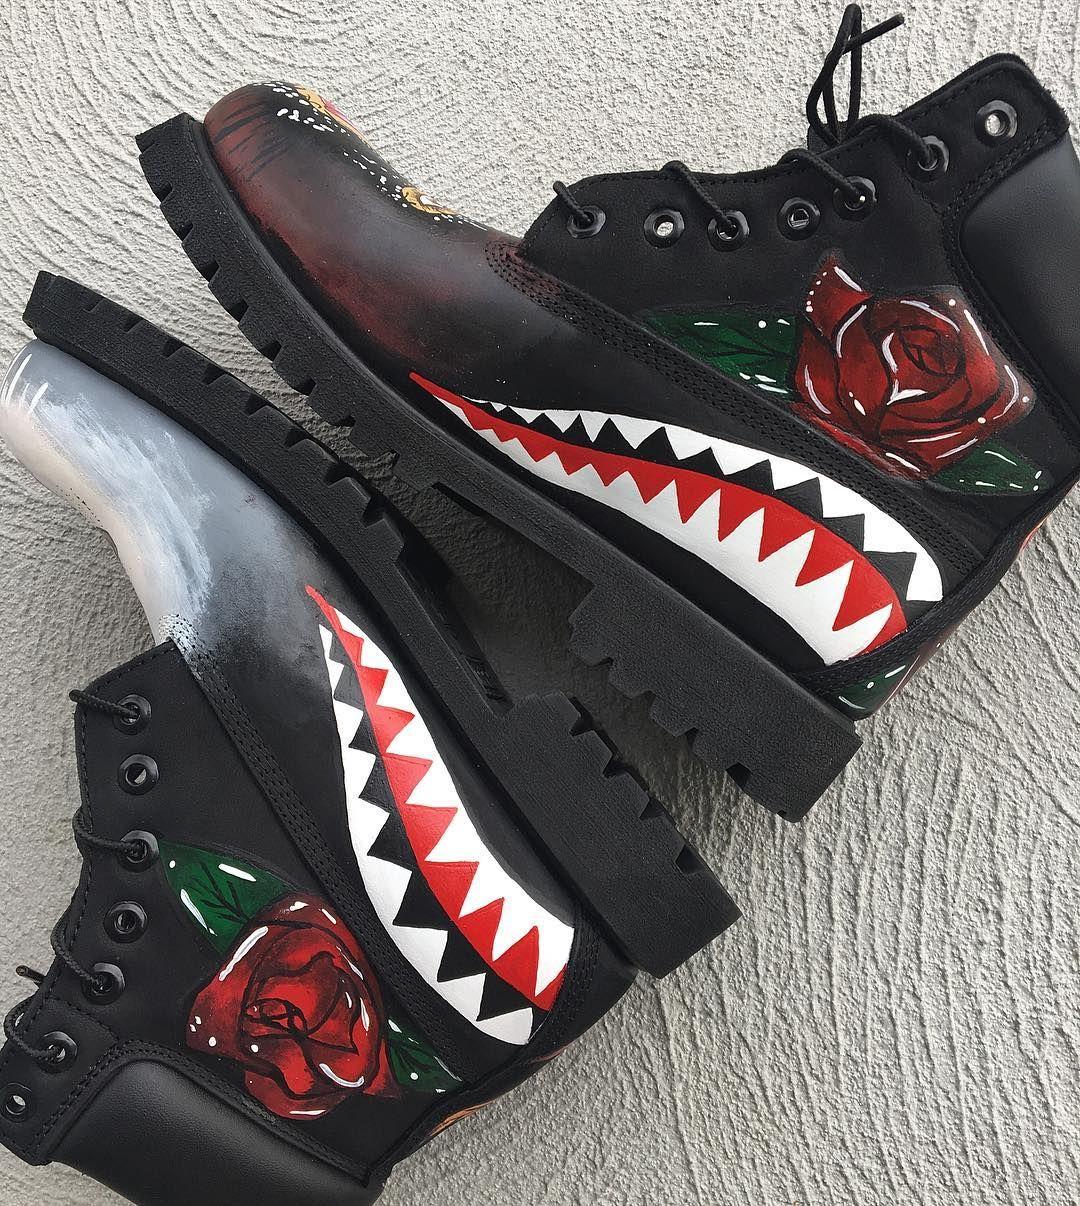 184c60fffe18 Freestyle custom  timberland boots. Full video coming soon  art  eka  brand